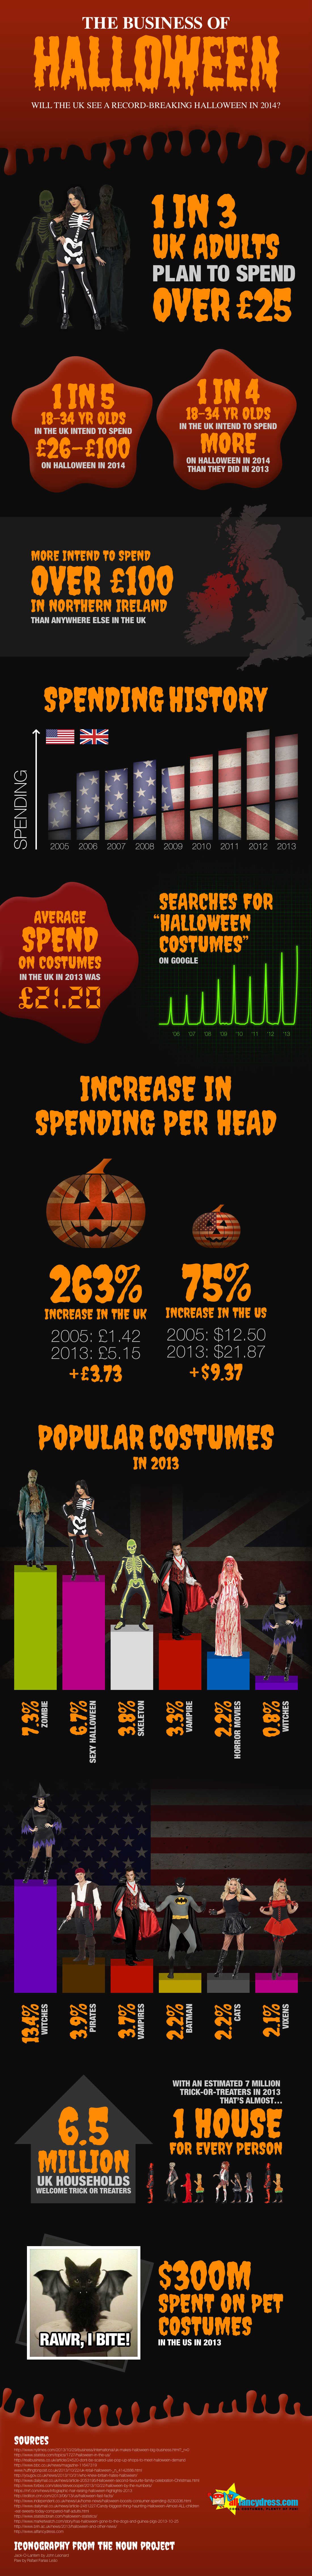 Business of Halloween